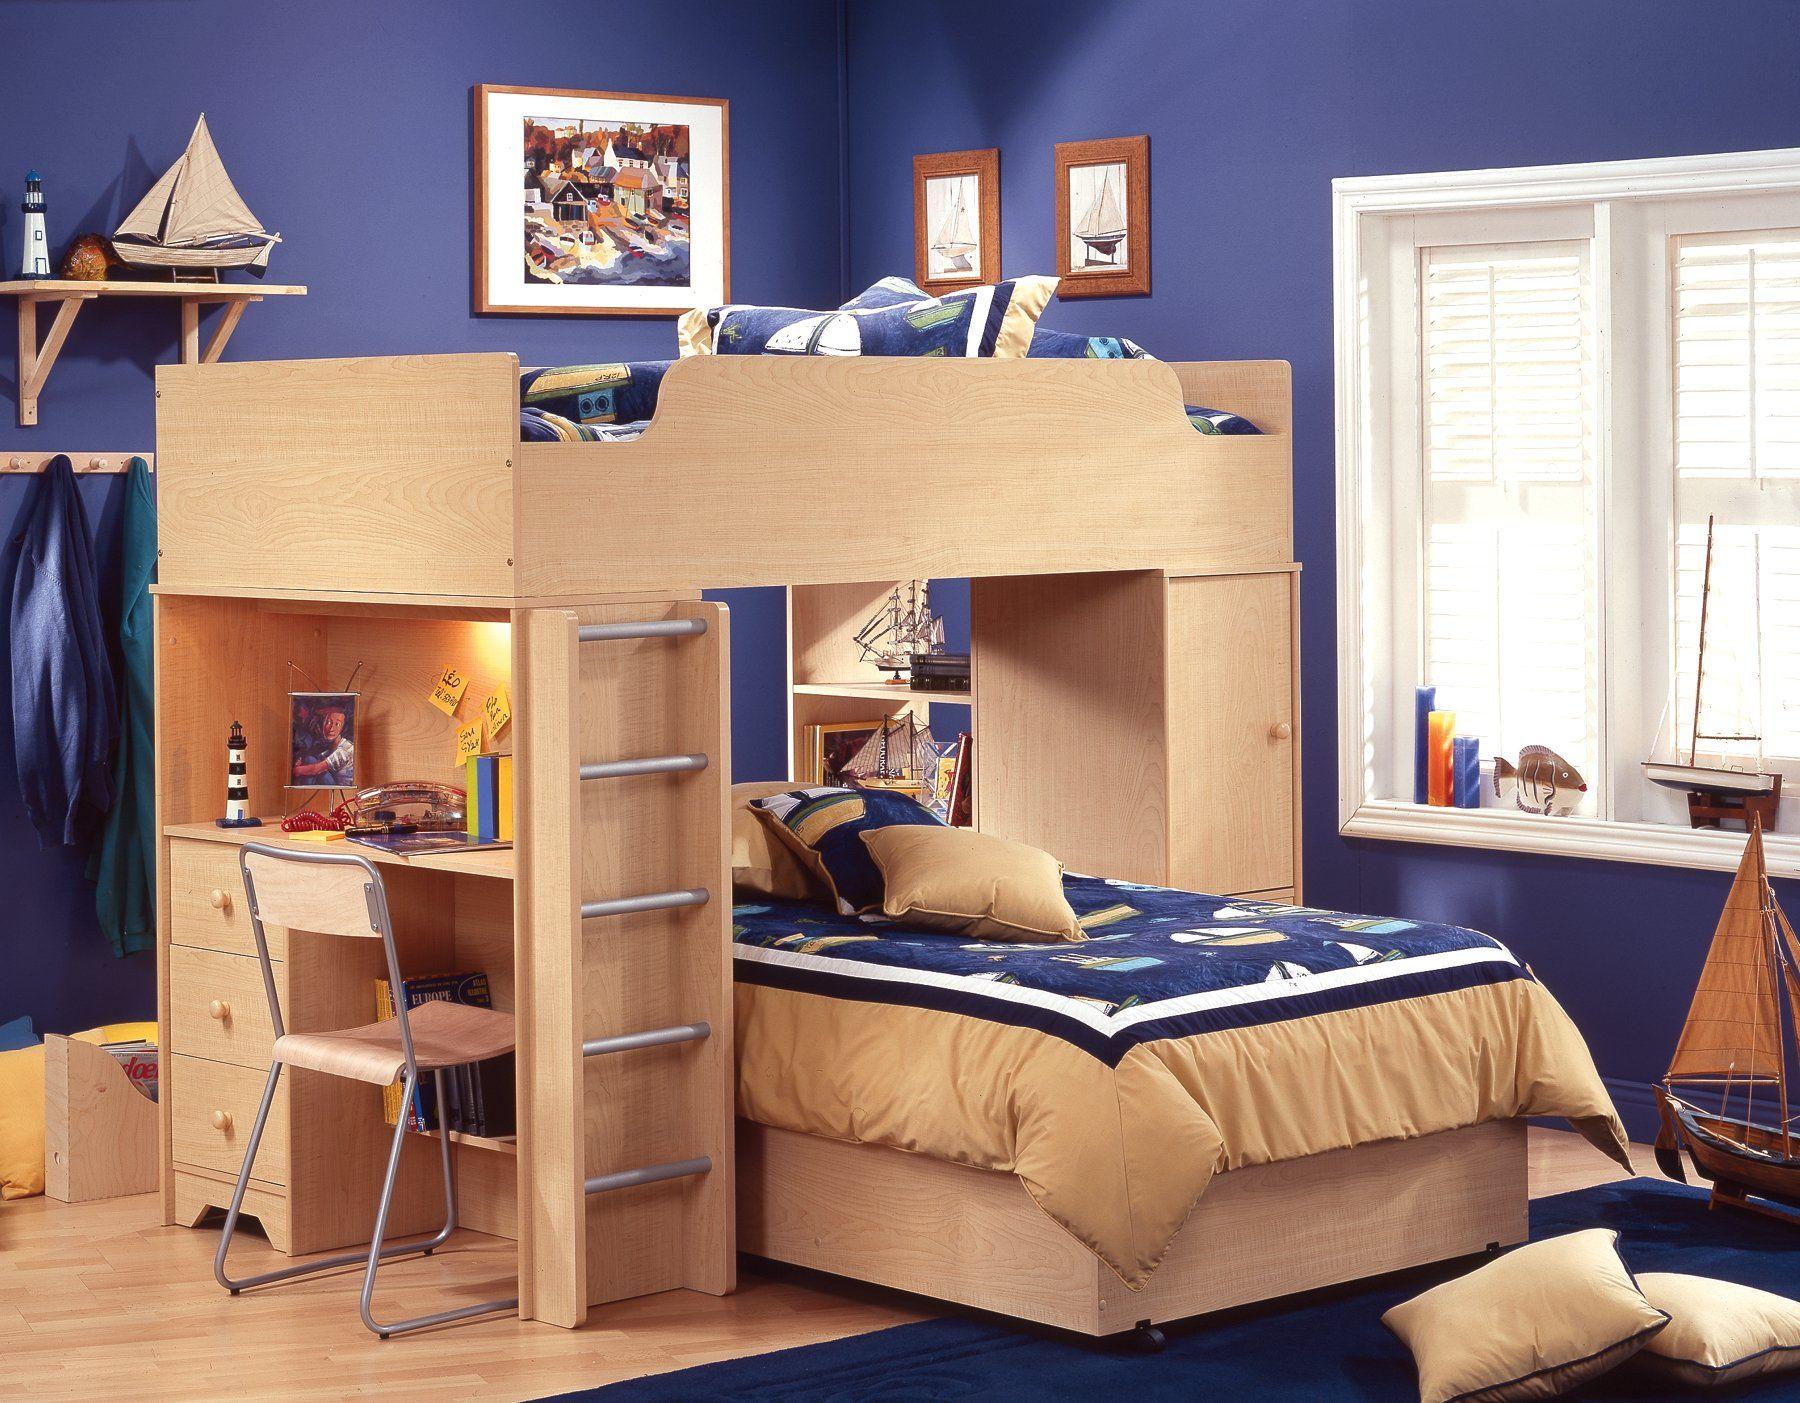 Loft bed ideas diy  Shared bedroom  Children bedroom  Pinterest  Toddler loft beds